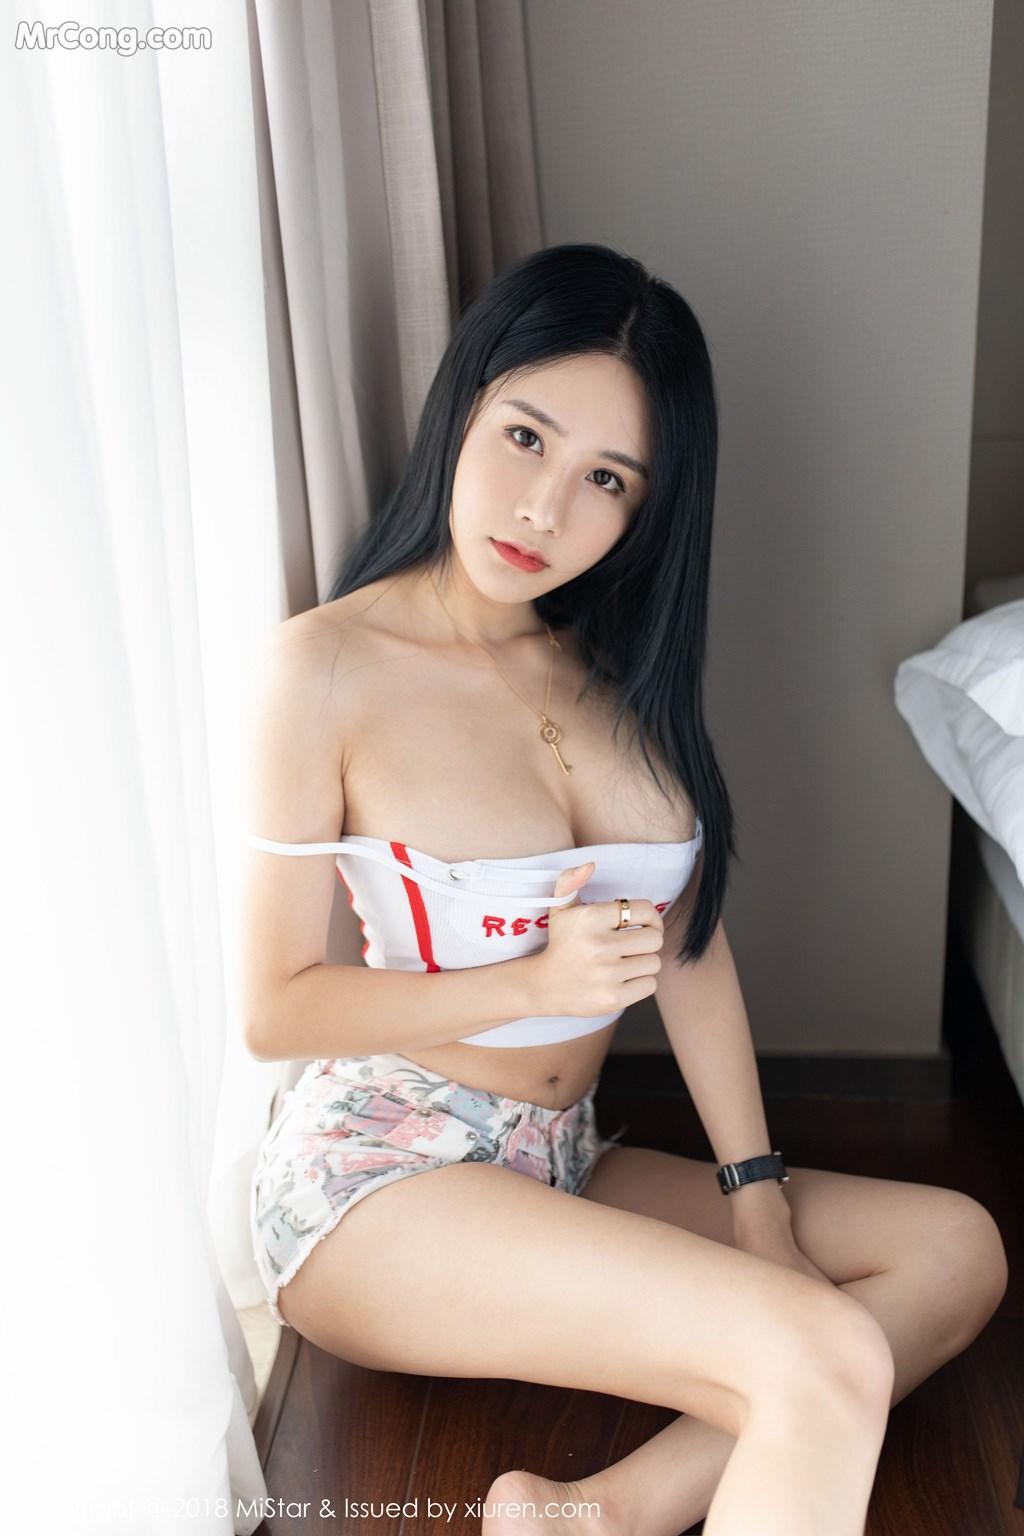 Image MiStar-Vol.248-Xiao-Mo-Lin-MrCong.com-033 in post MiStar Vol.248: Người mẫu Xiao Mo Lin (小沫琳) (44 ảnh)